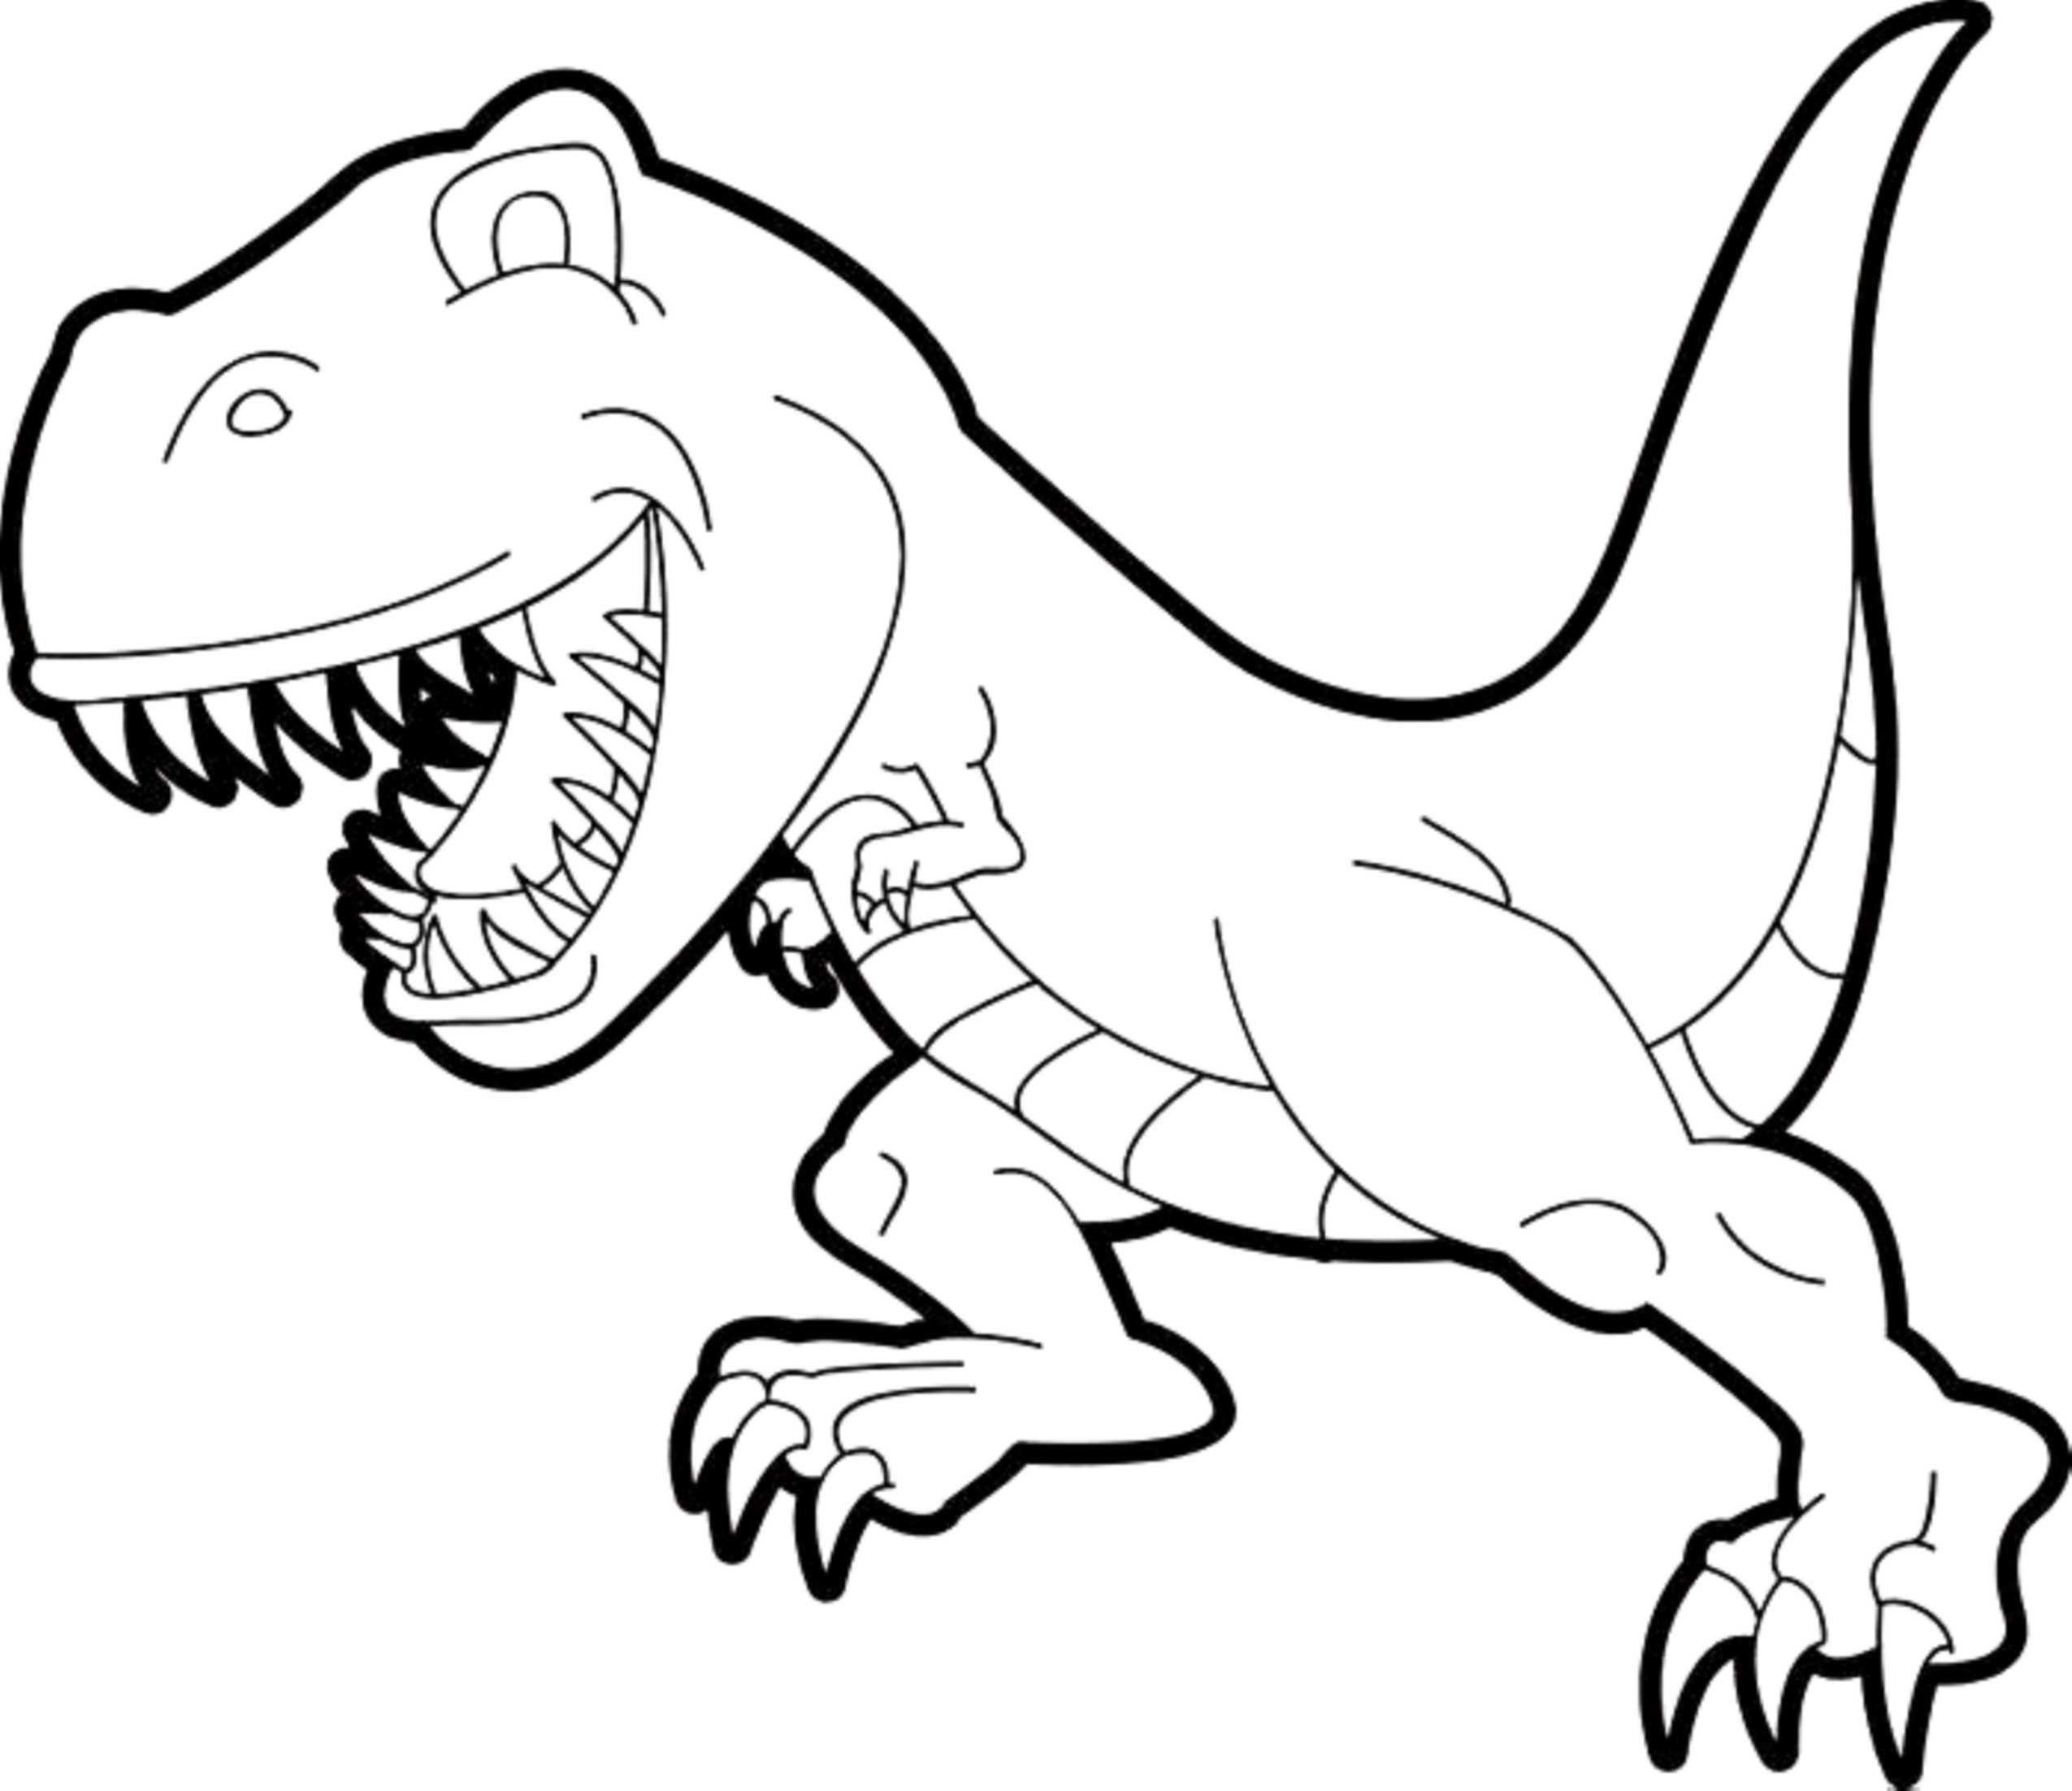 Jurassic Park Coloring Pages Awesome 35 Jurassic World Coloring Pages Dinosaurus Tiranosaurus Drawing